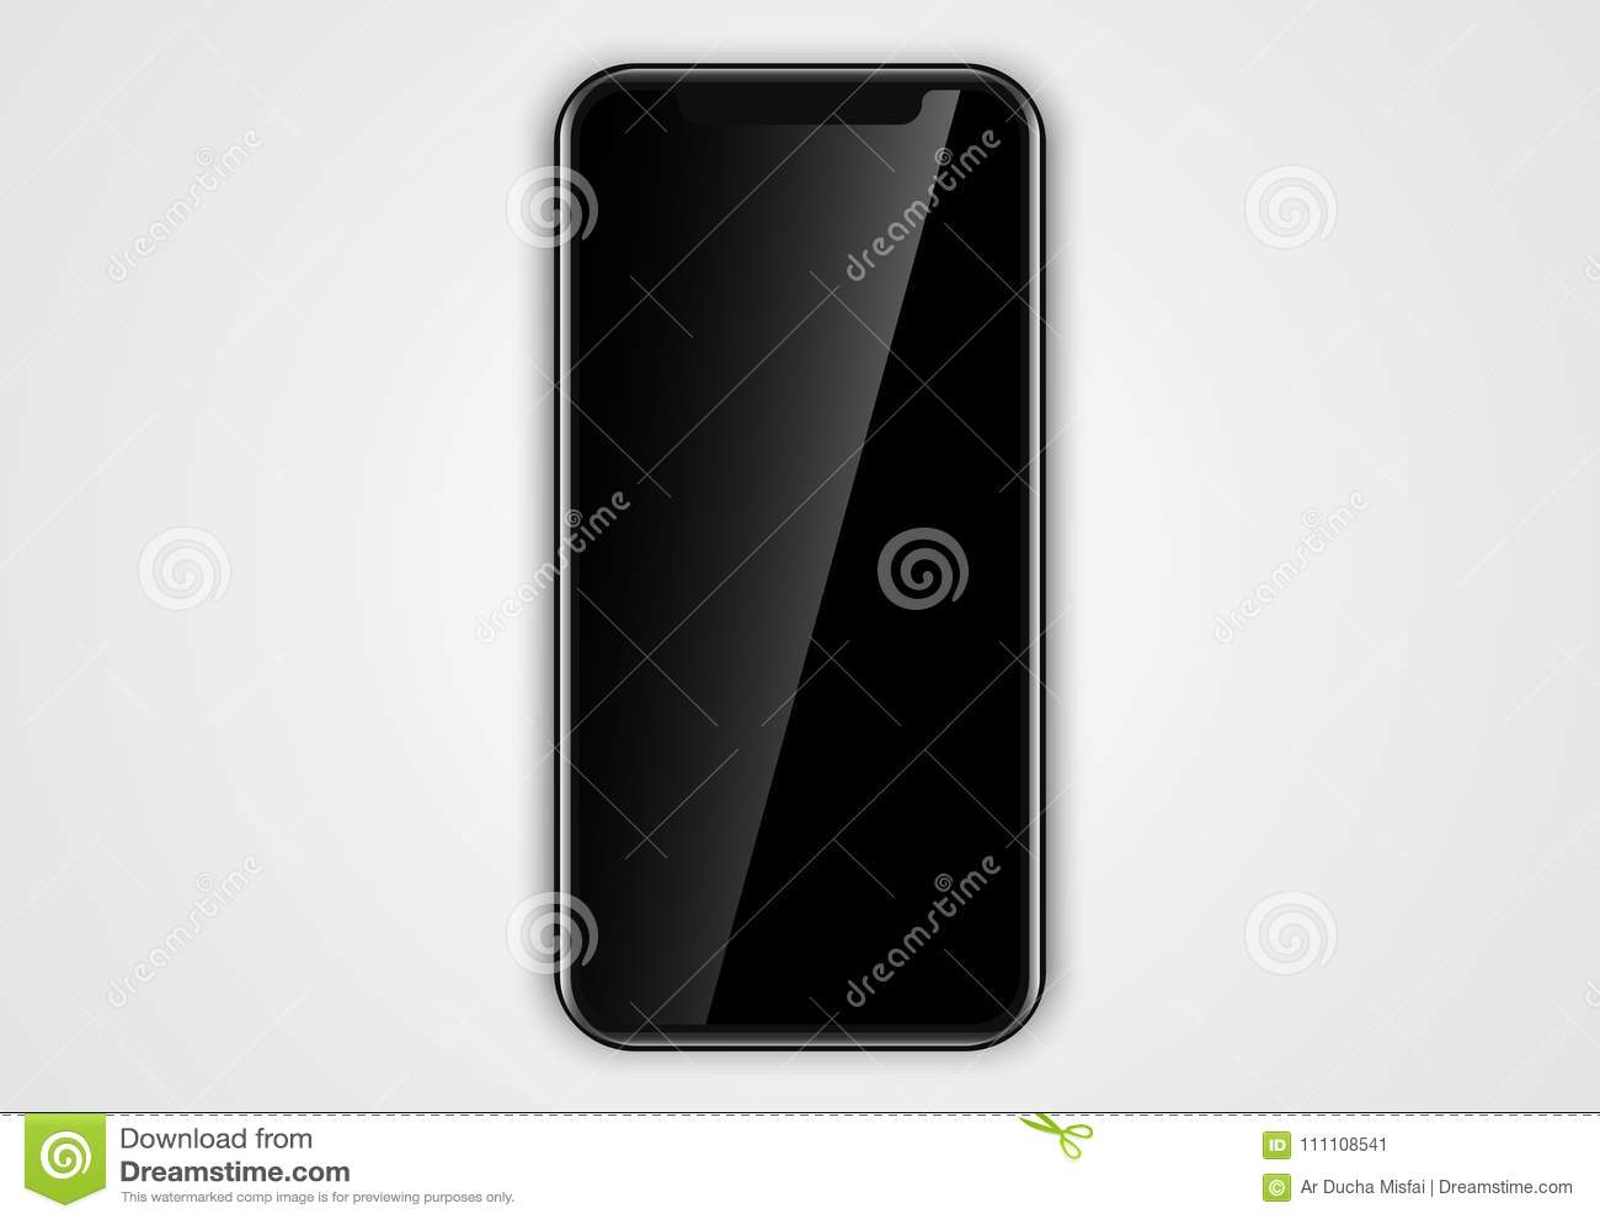 Blank Phone Frame Design For Template User Interface